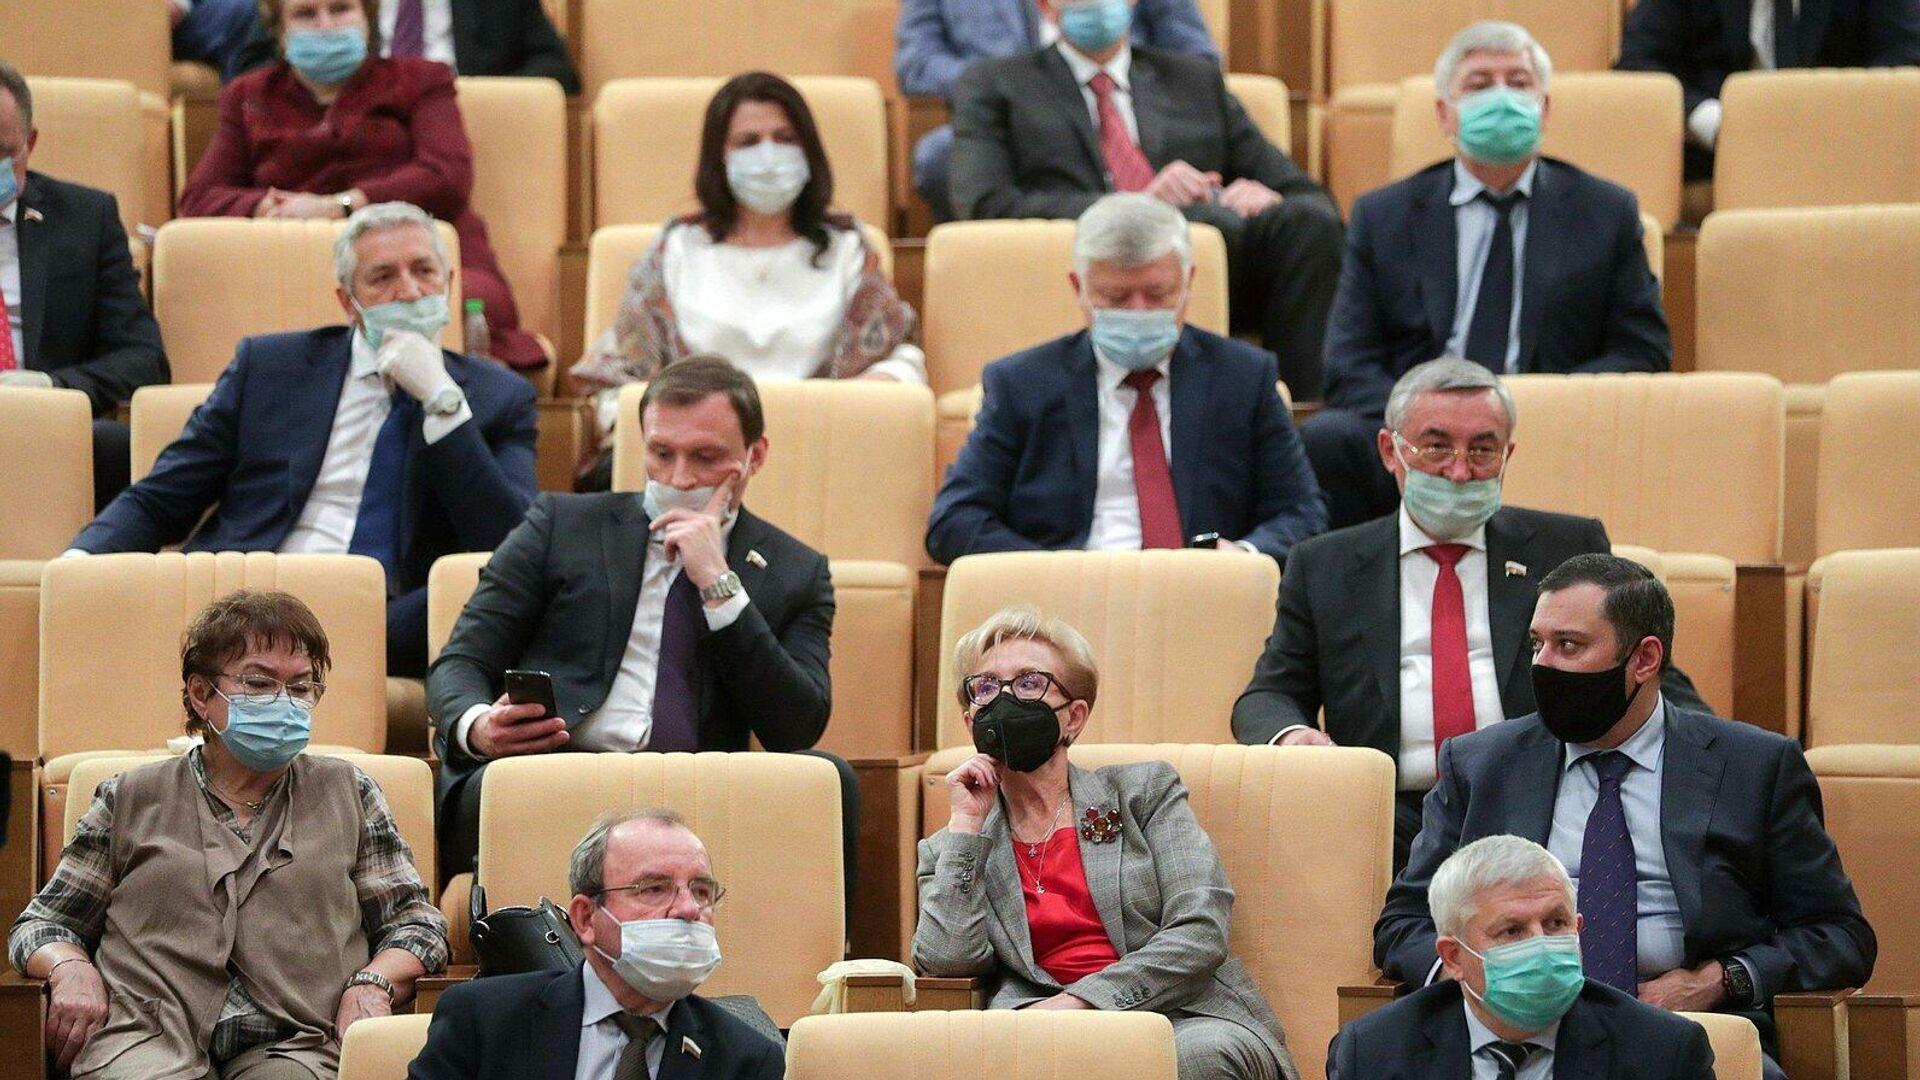 На заседании по обсуждению проекта федерального бюджета на 2021 год в Госдуме - РИА Новости, 1920, 26.10.2020